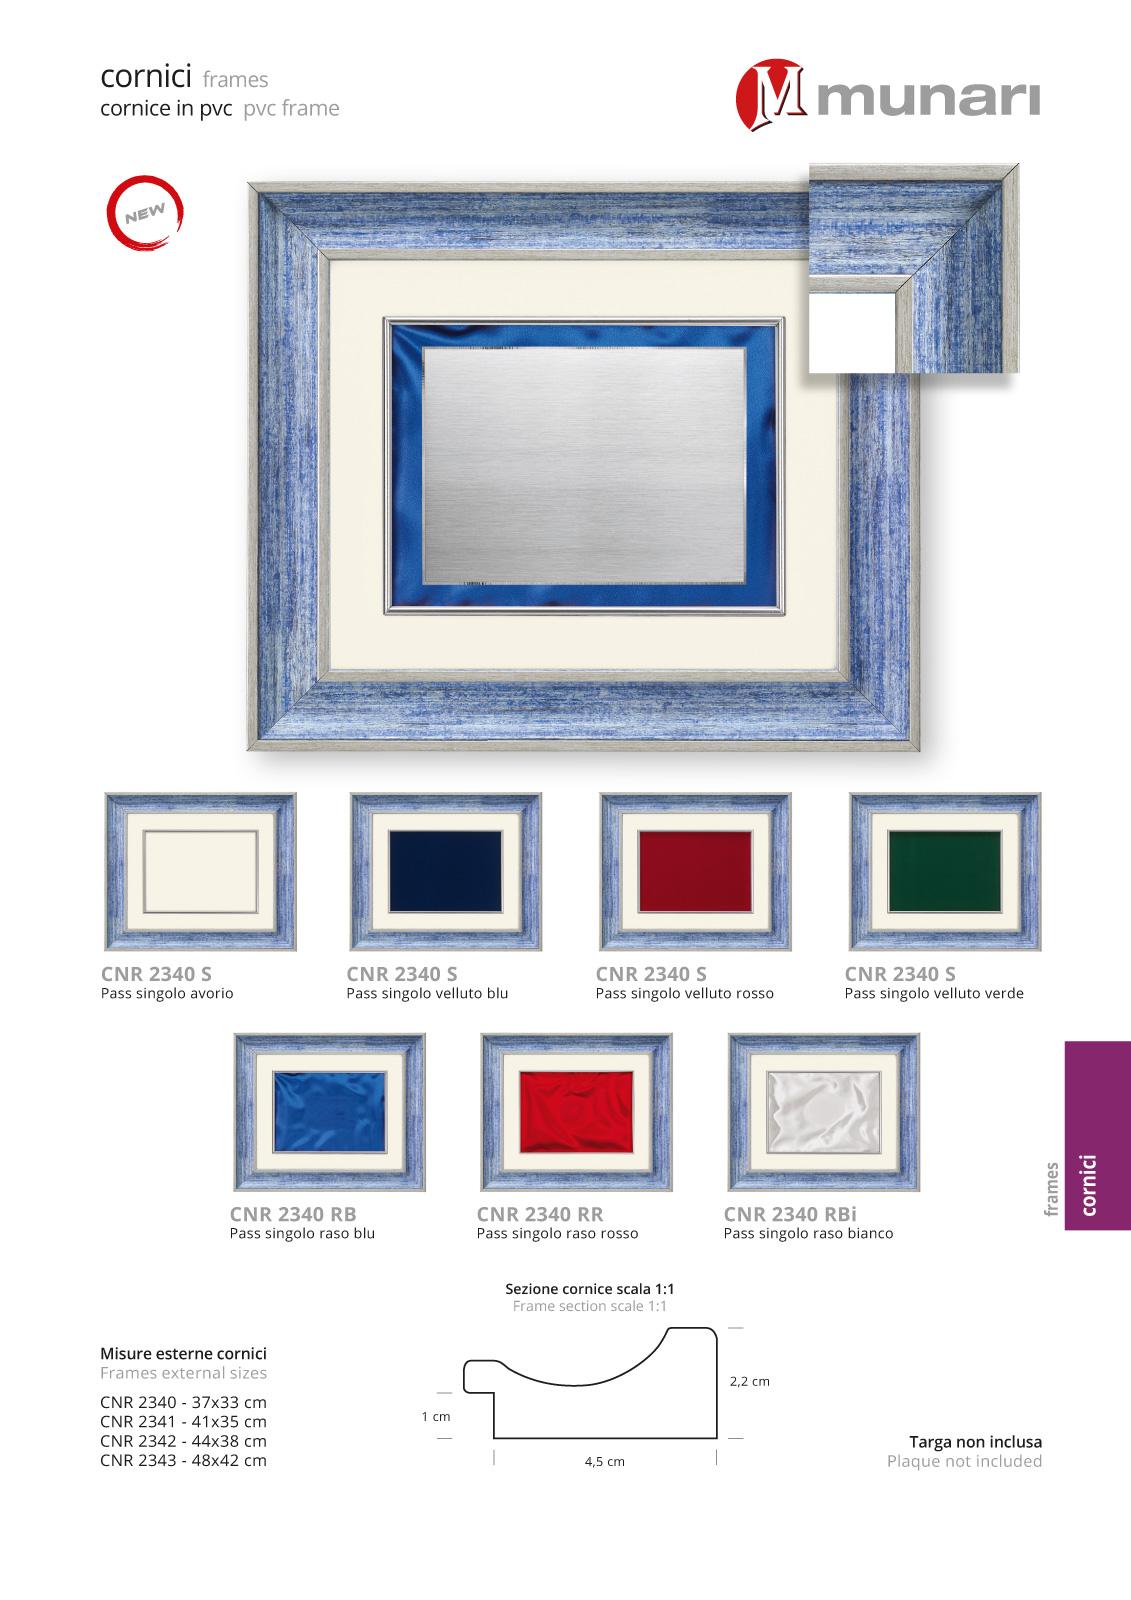 PVC frames series CNR 2340